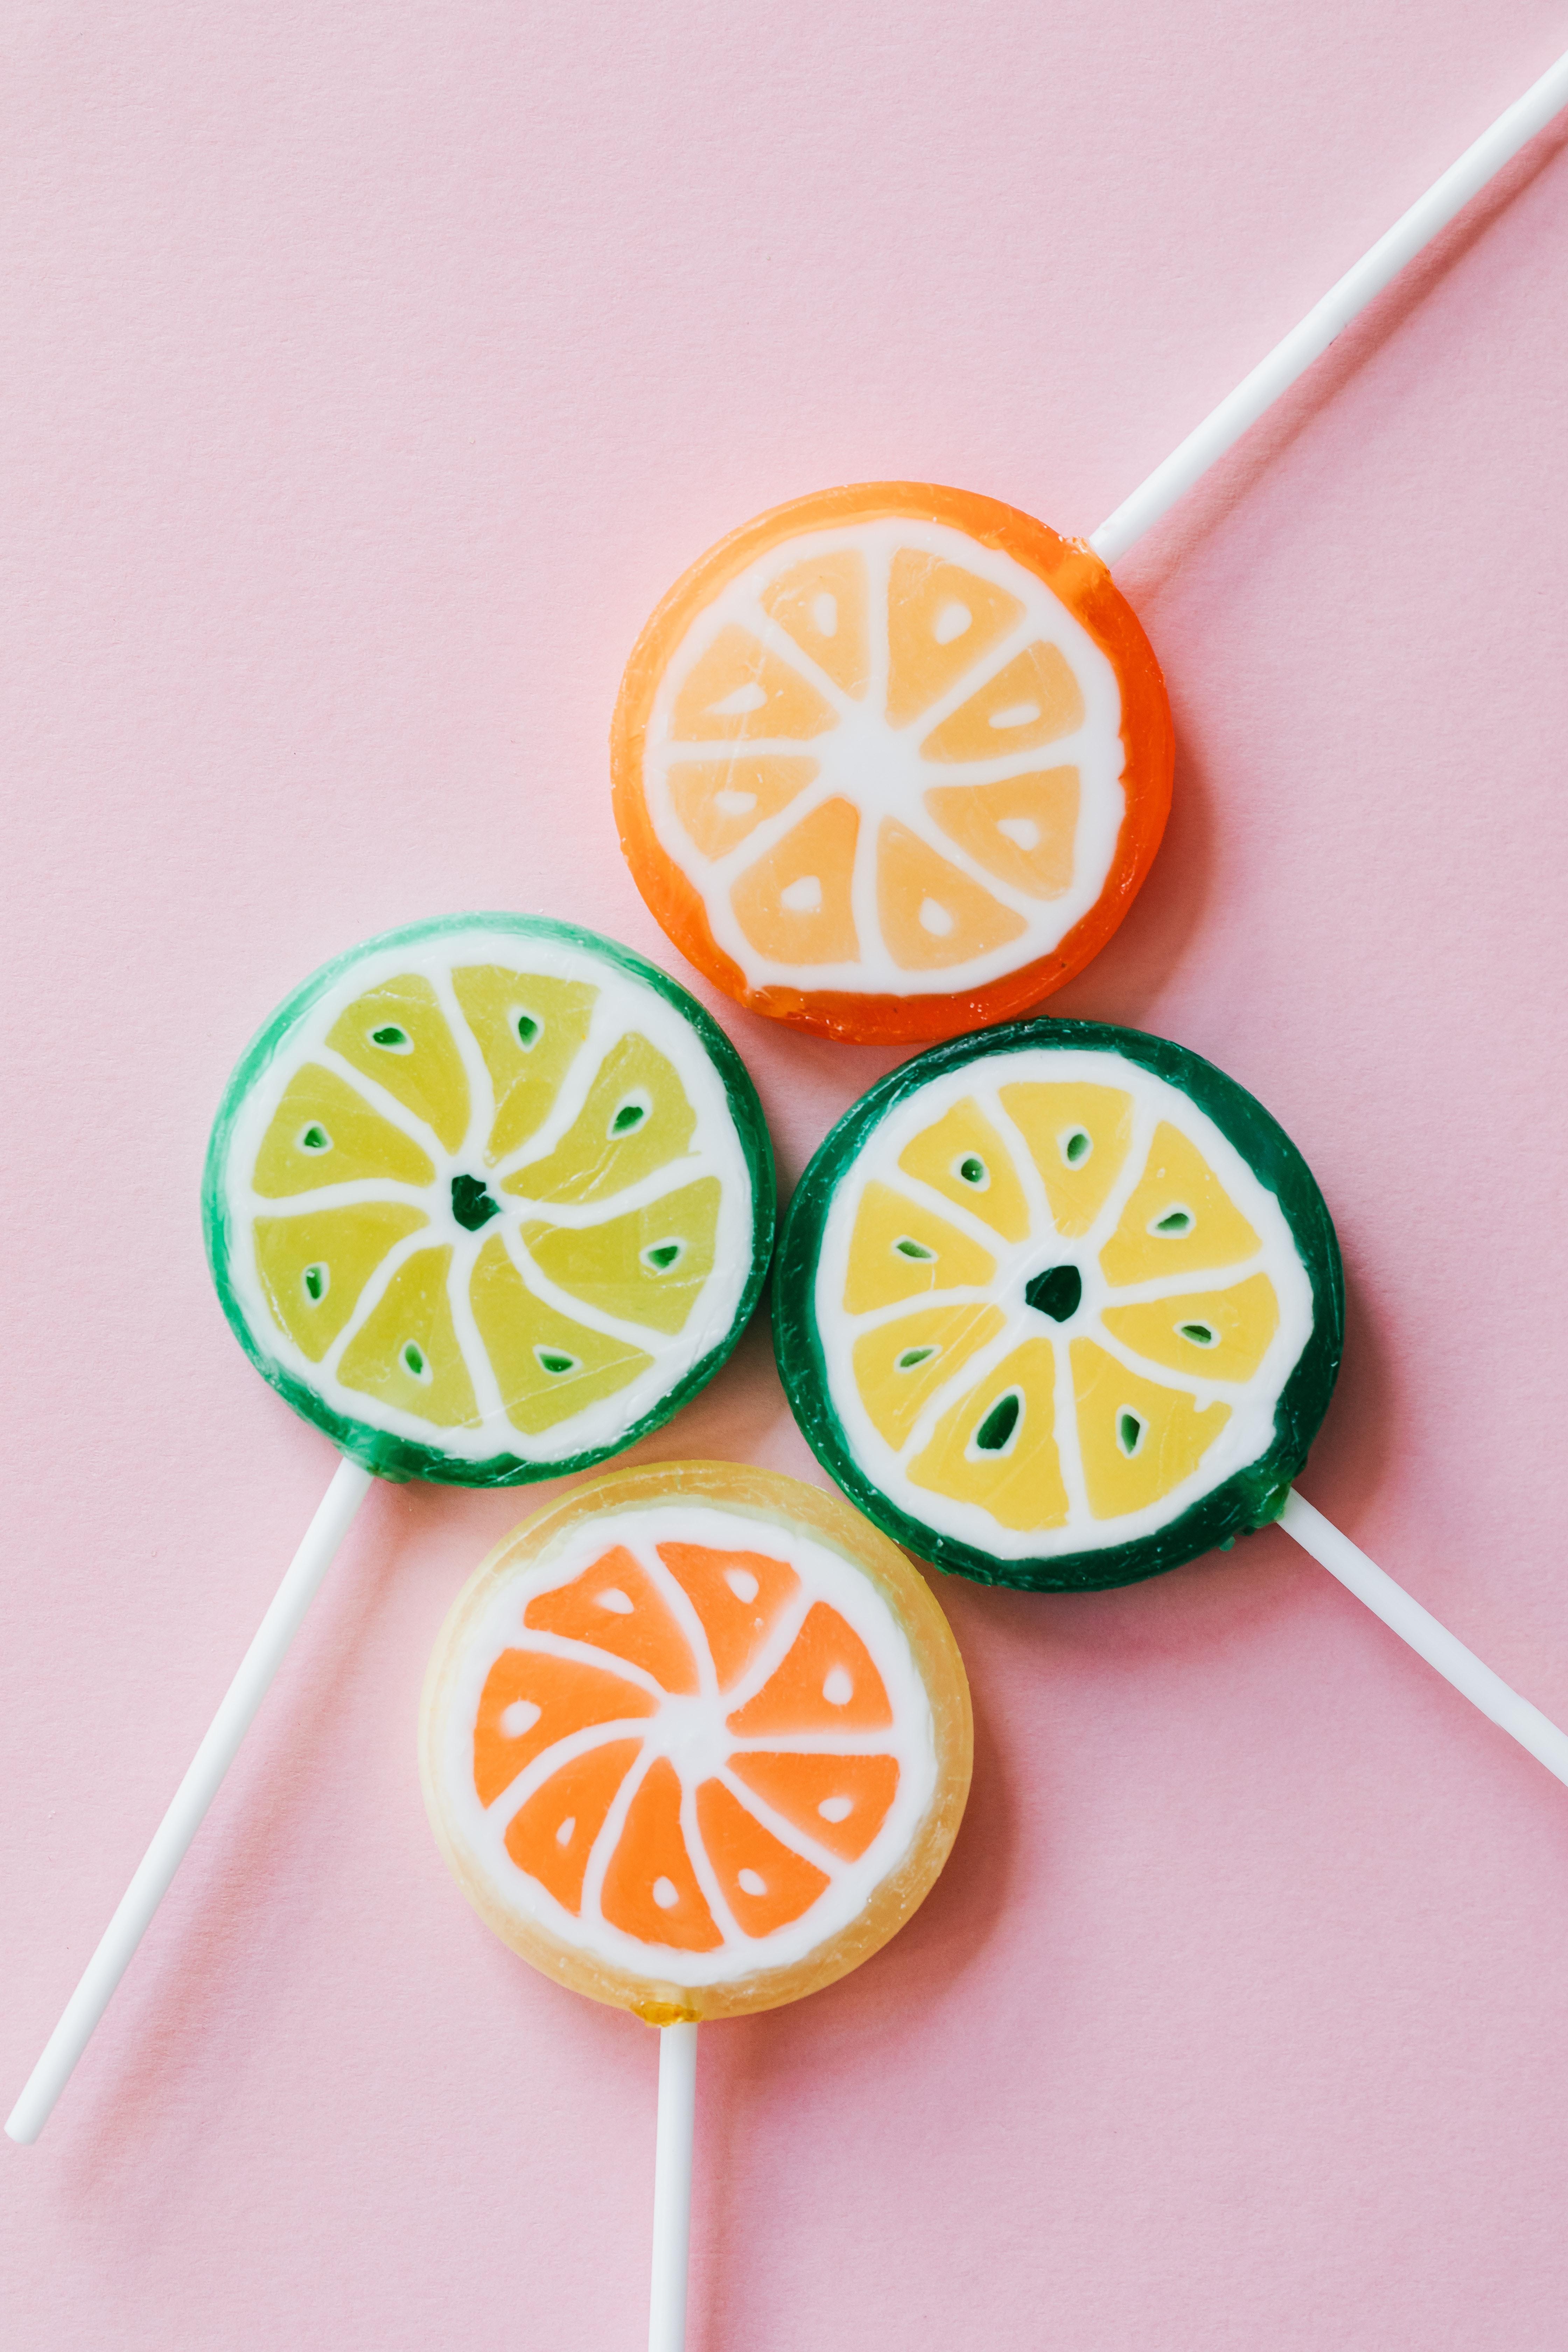 CBD Lollipops